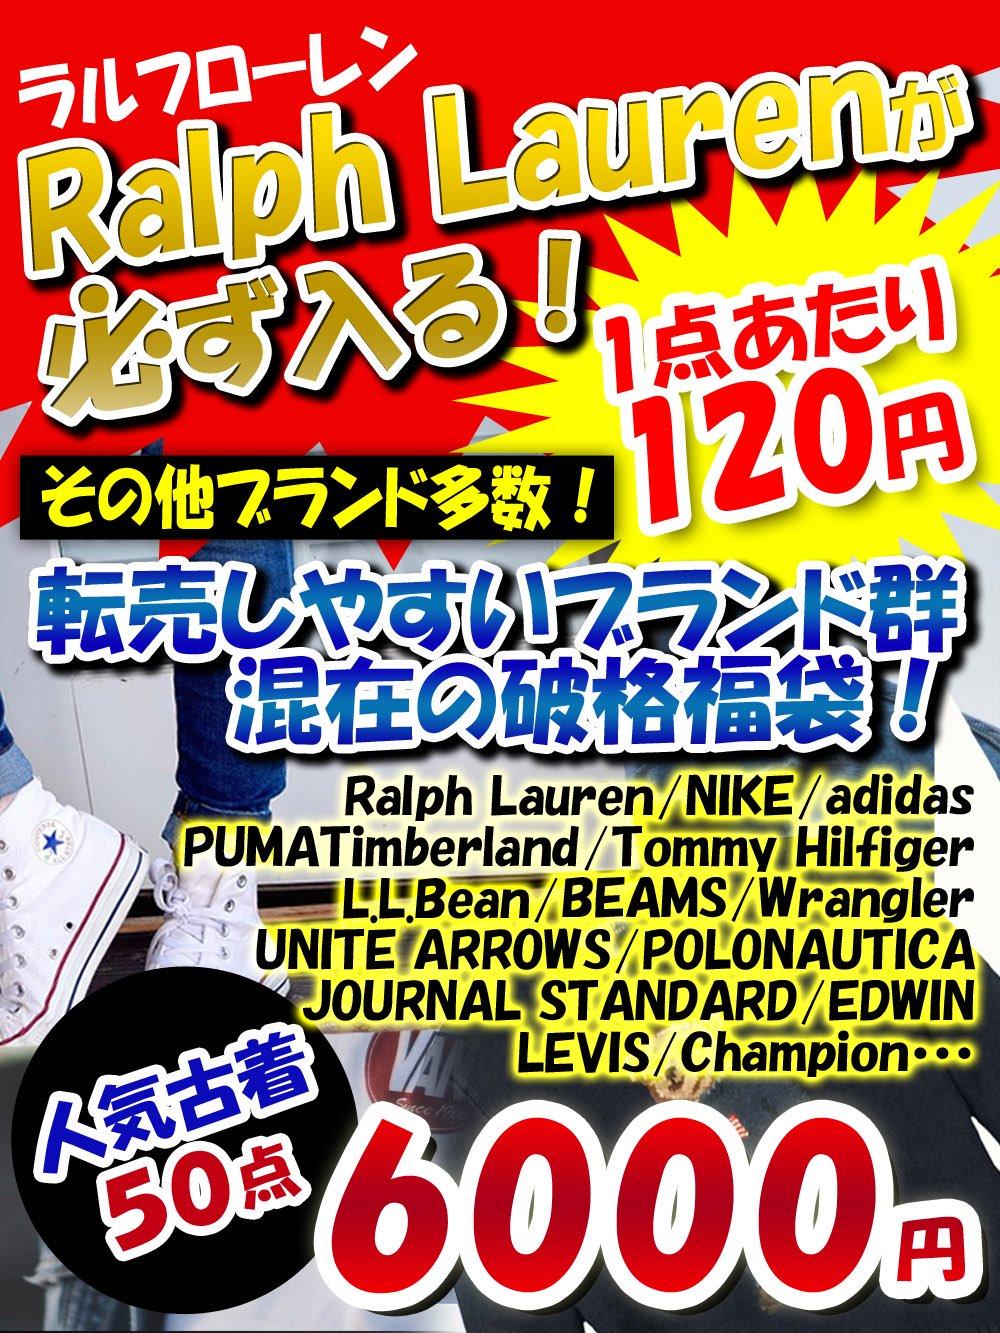 【Ralph Laurenが必ず入る】毎回完売!転売楽々ブランド群混在!破格古着福袋!【50点】6000円